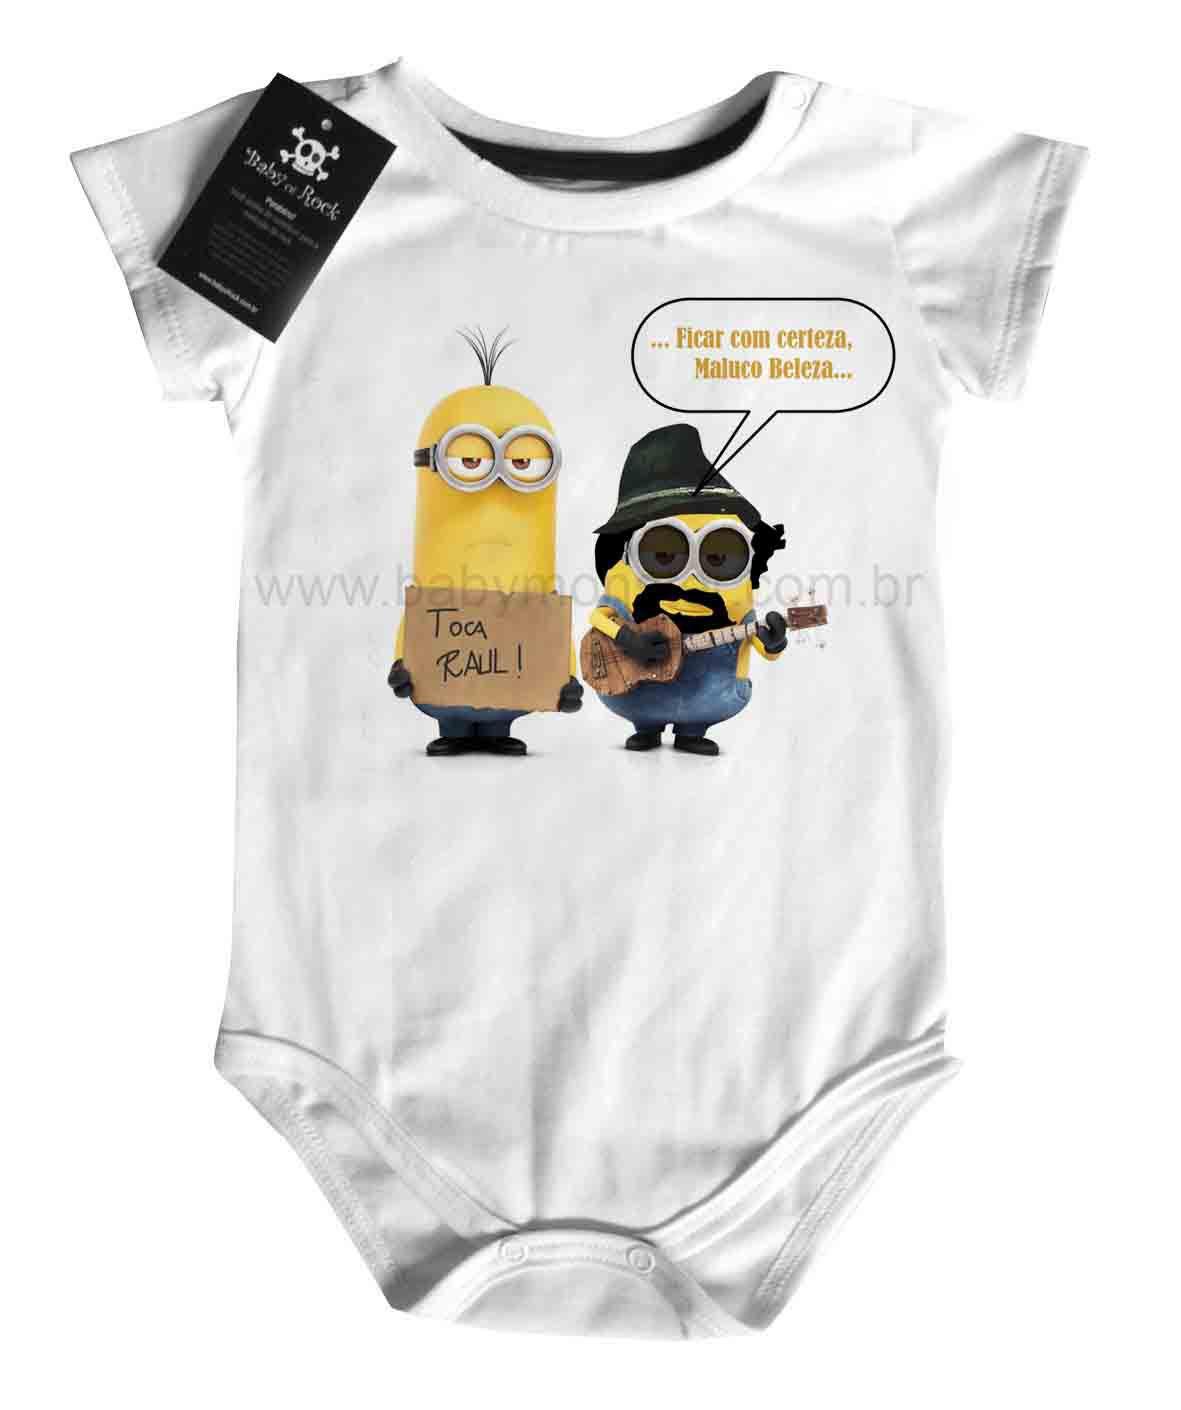 Body Bebê Rock Toca Raul Minions  - Baby Monster S/A